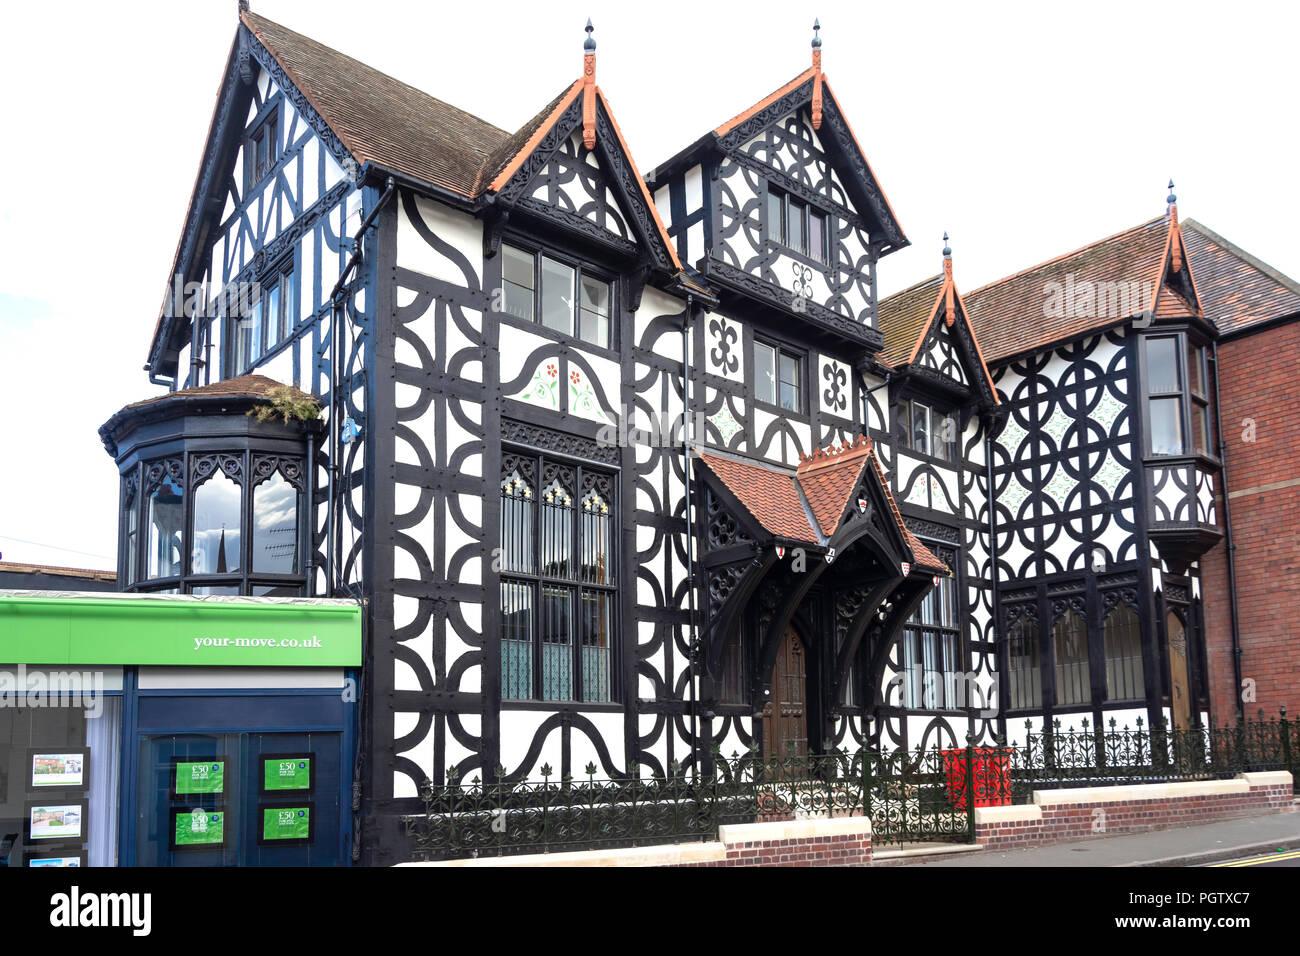 former 16th century 'Old Hop Pole Inn', New Street, Bromsgrove, Worcestershire, England, United Kingdom - Stock Image